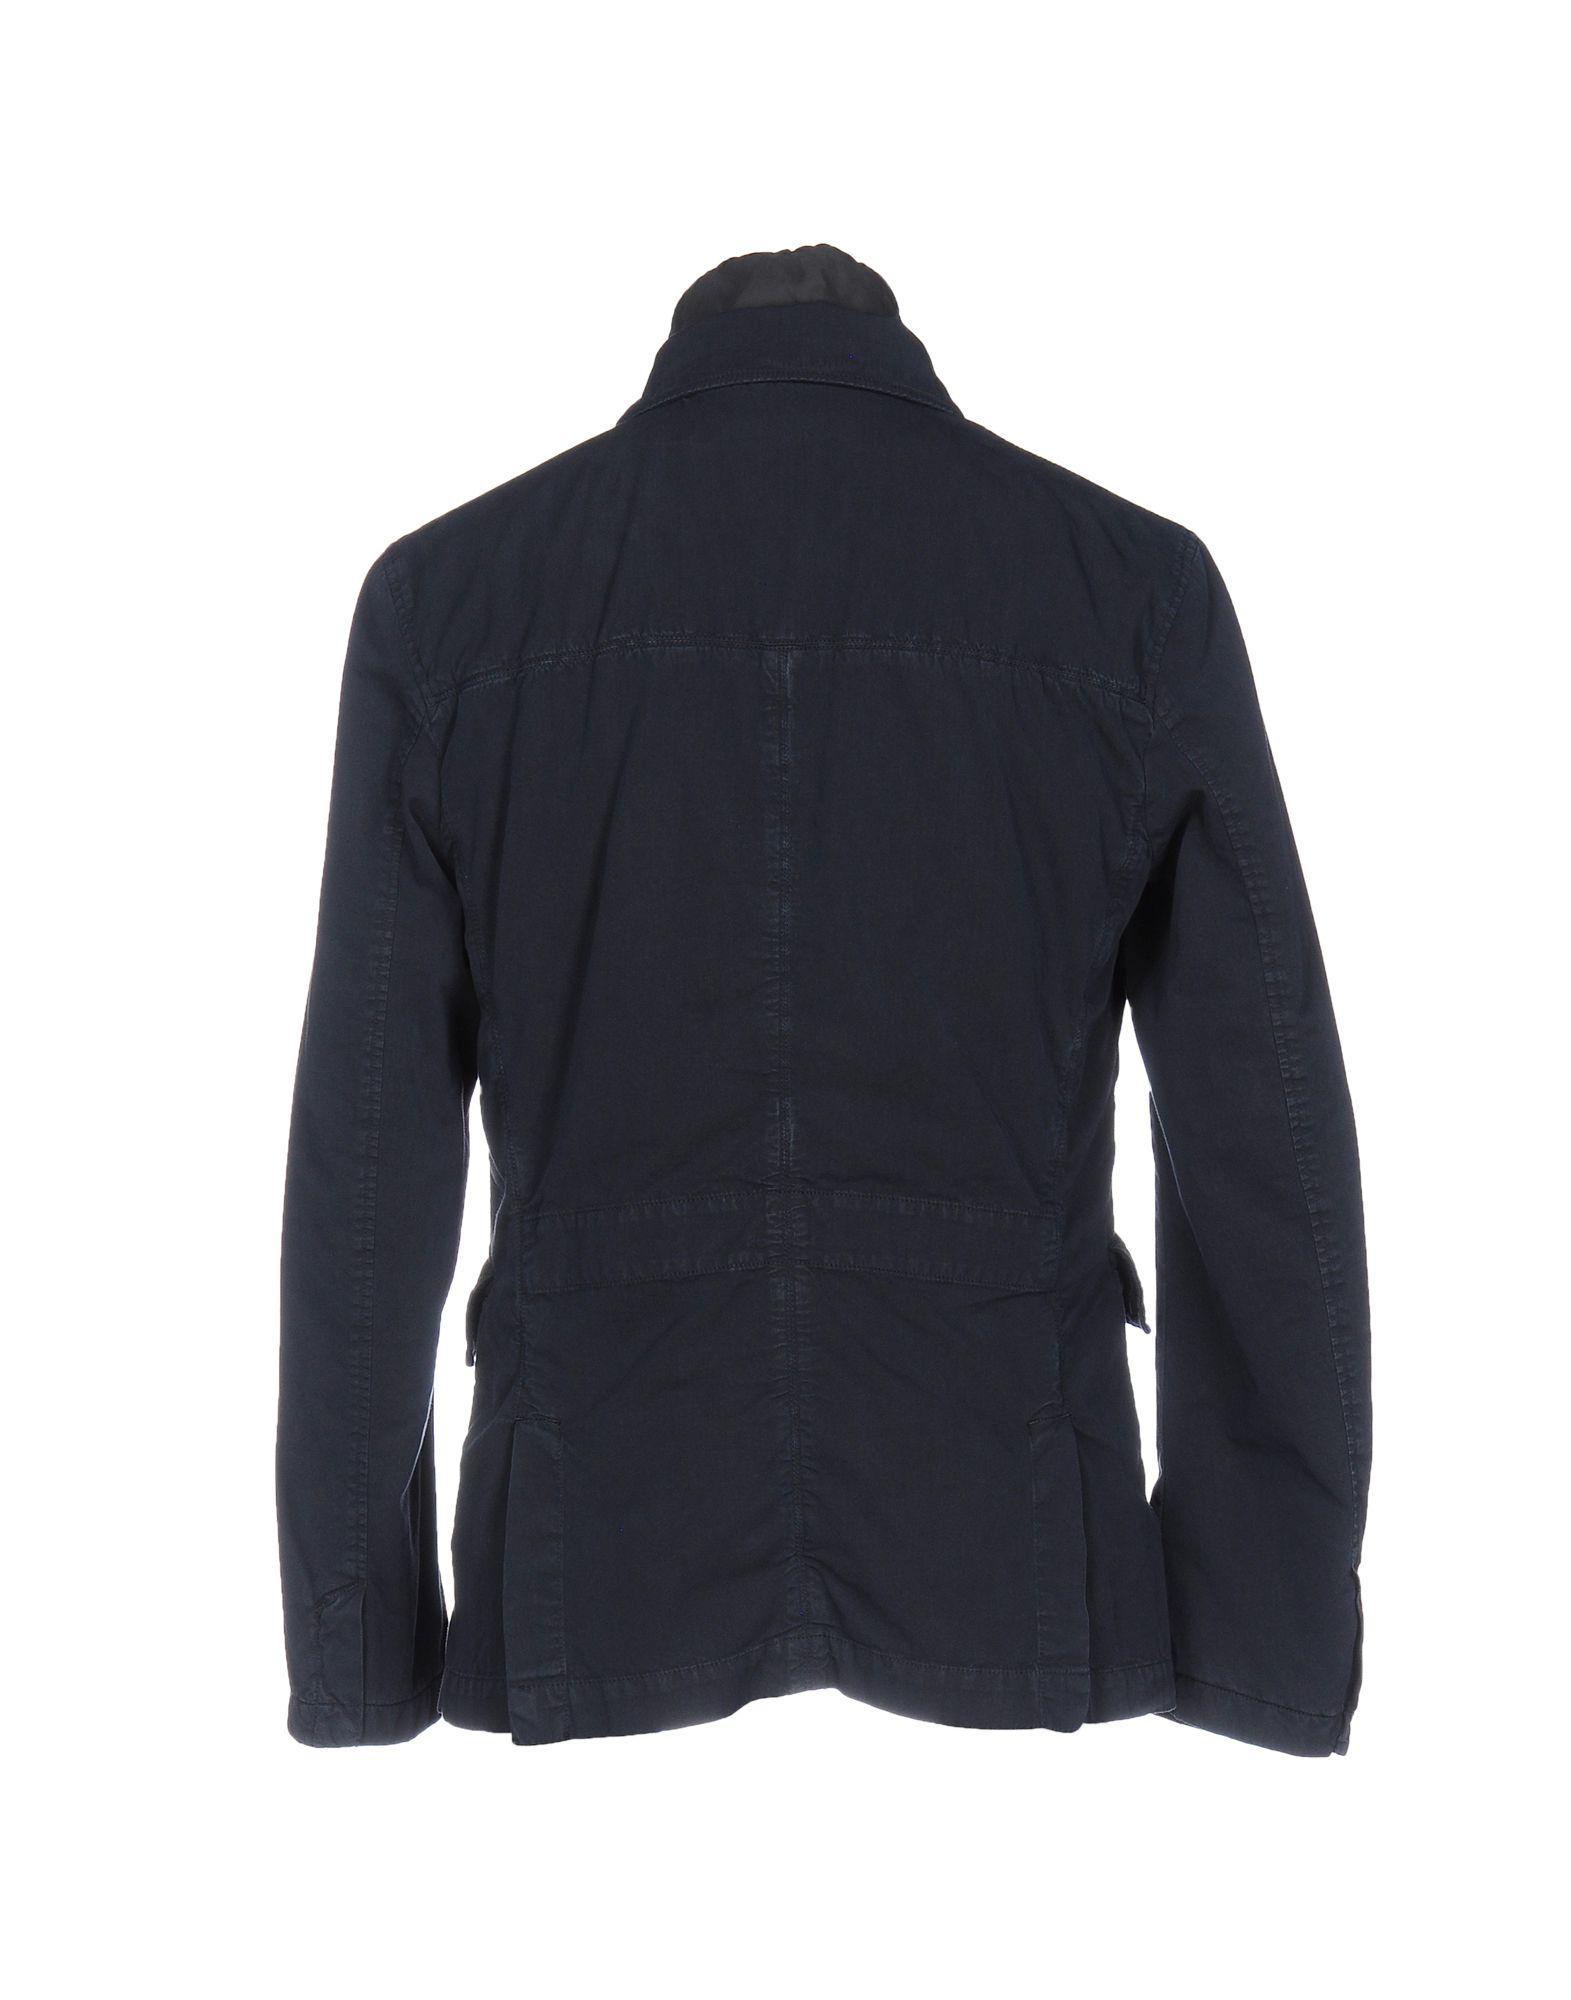 L.B.M. 1911 Synthetic Jacket in Dark Blue (Blue) for Men